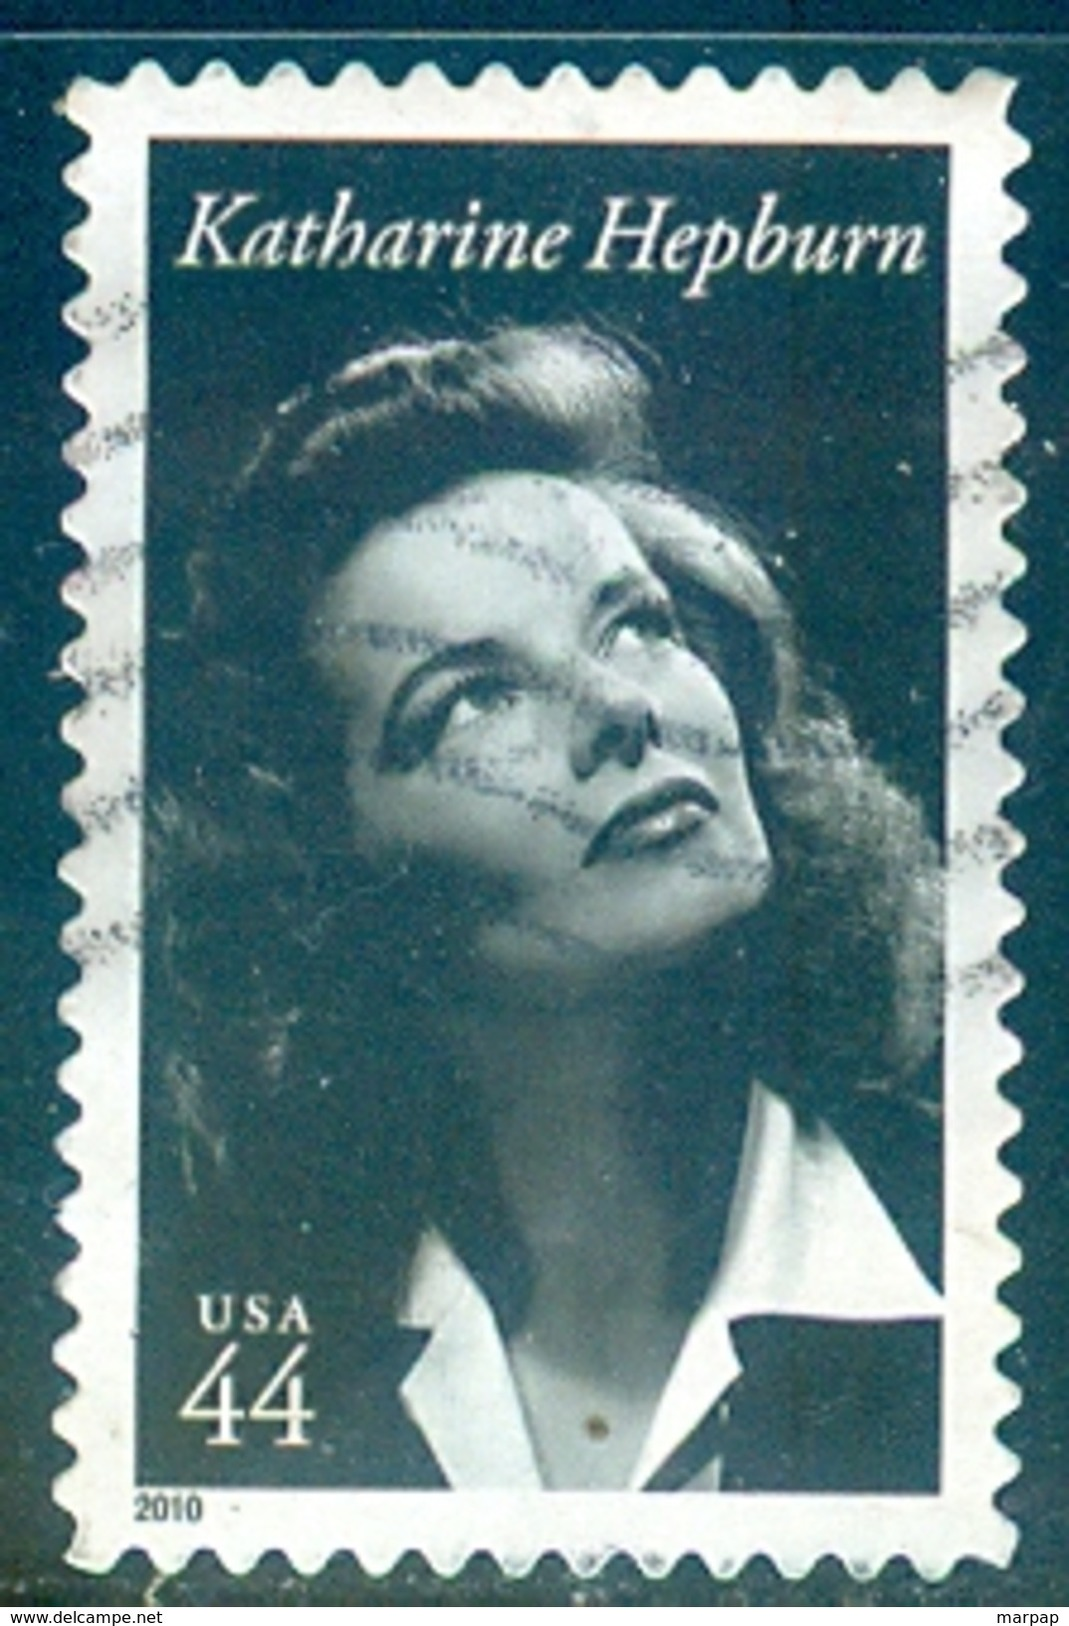 USA, Yvert No 4282 - United States